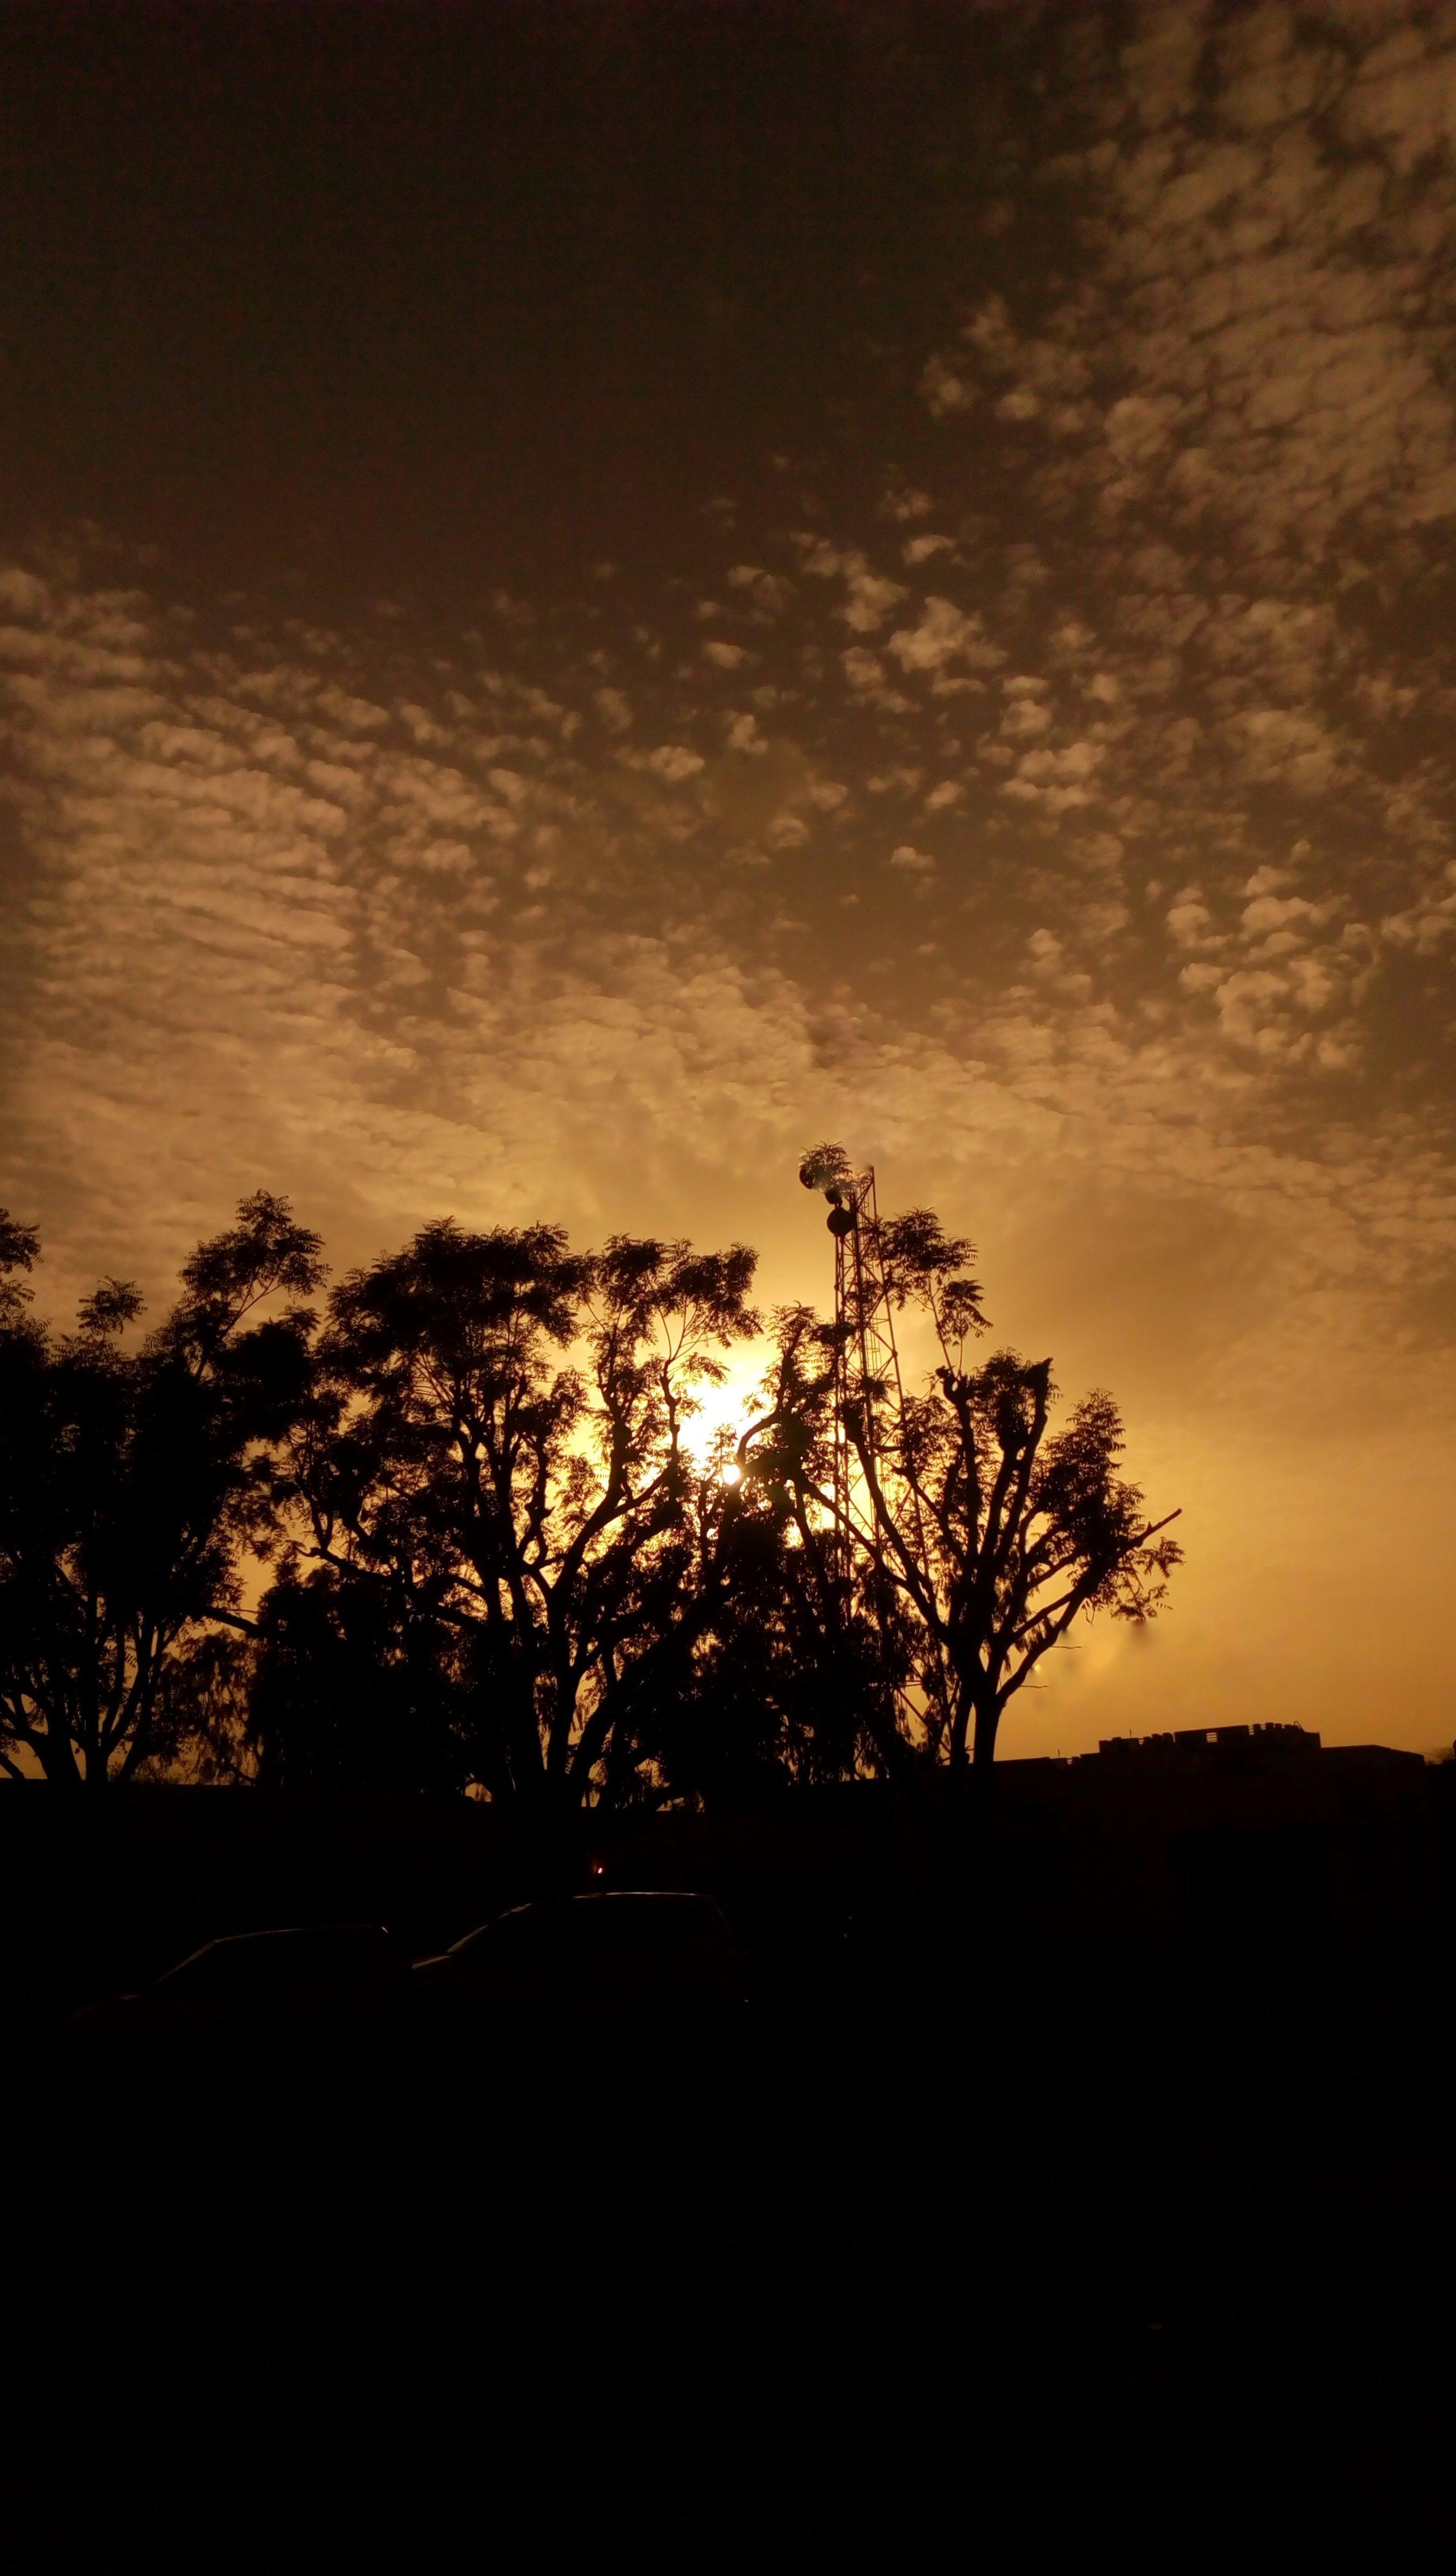 Foto d'estoc gratuïta de #bookstagram #ilumination #tree #trees #eveningwa, #inveninglight #eveningmood #inveningmoon #nature #n